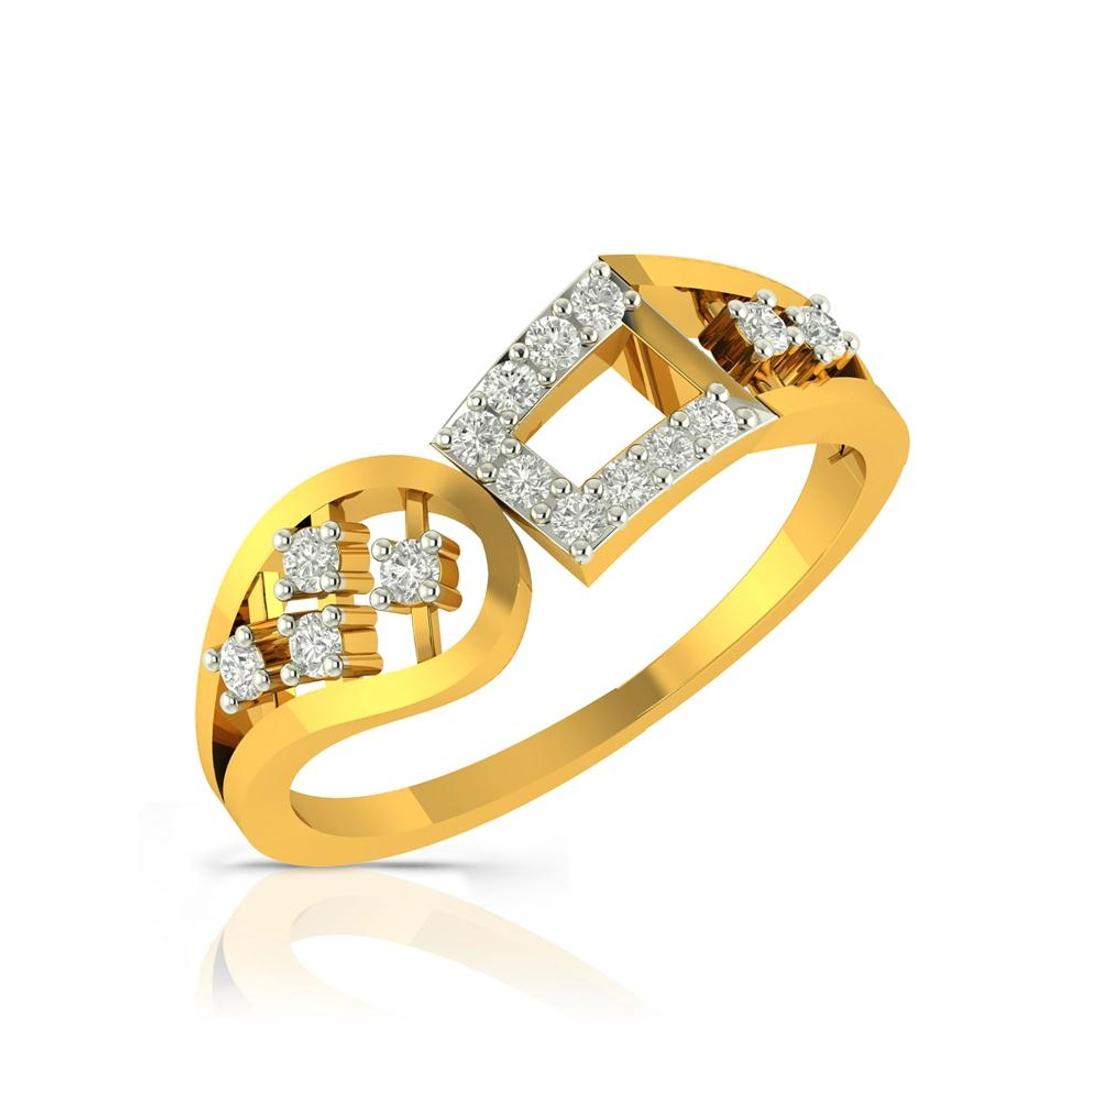 Buy Charu Jewels Diamond Ladies Ring CJLR0194 Online in India